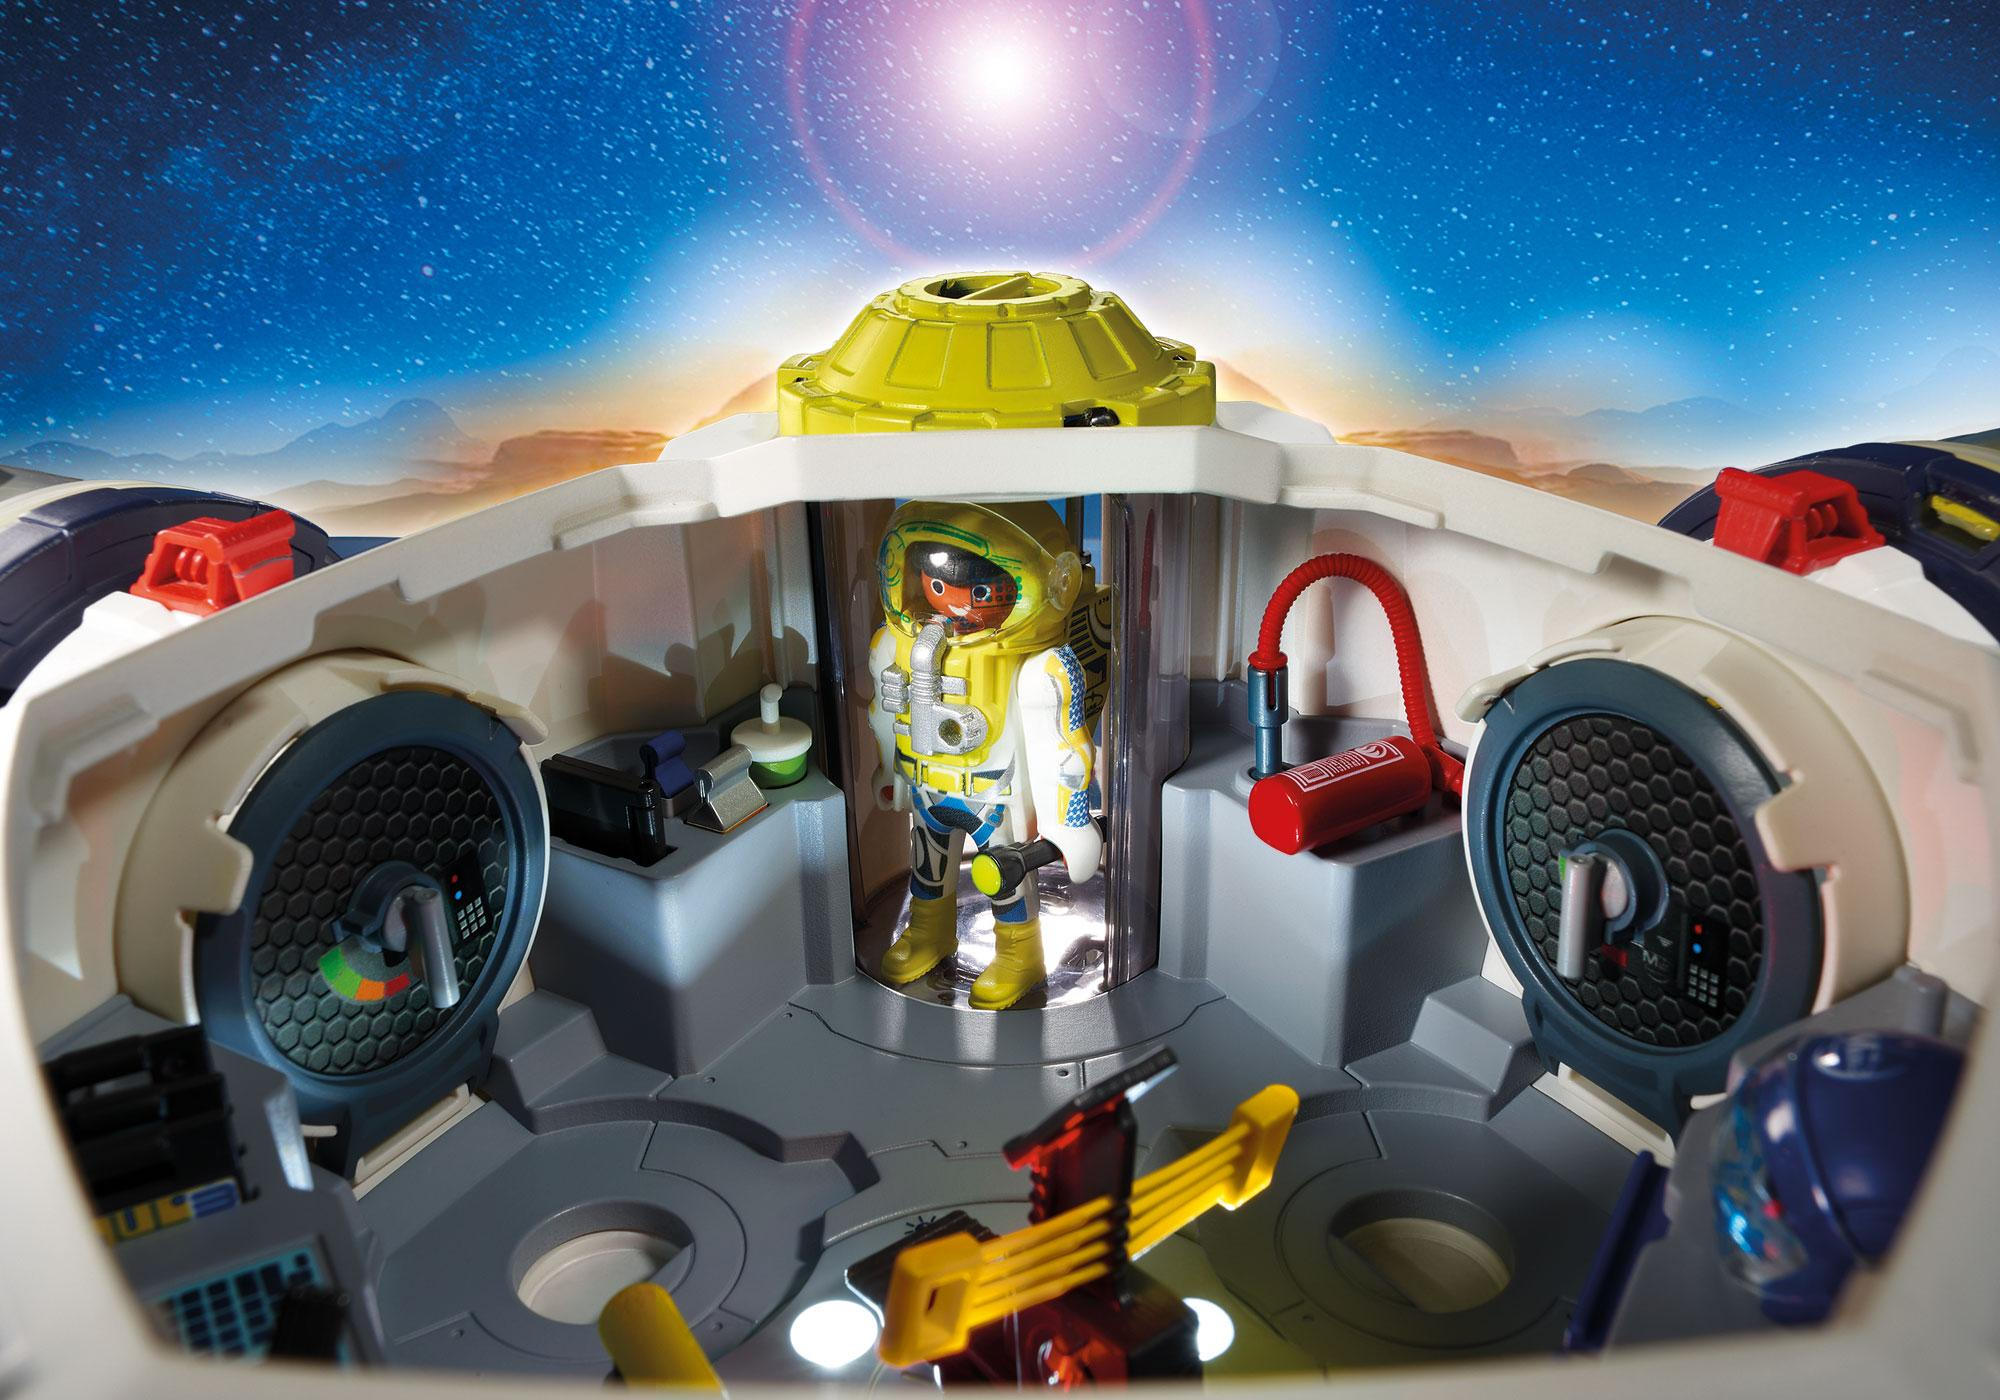 http://media.playmobil.com/i/playmobil/9487_product_extra2/Διαστημικός Σταθμός στον Άρη